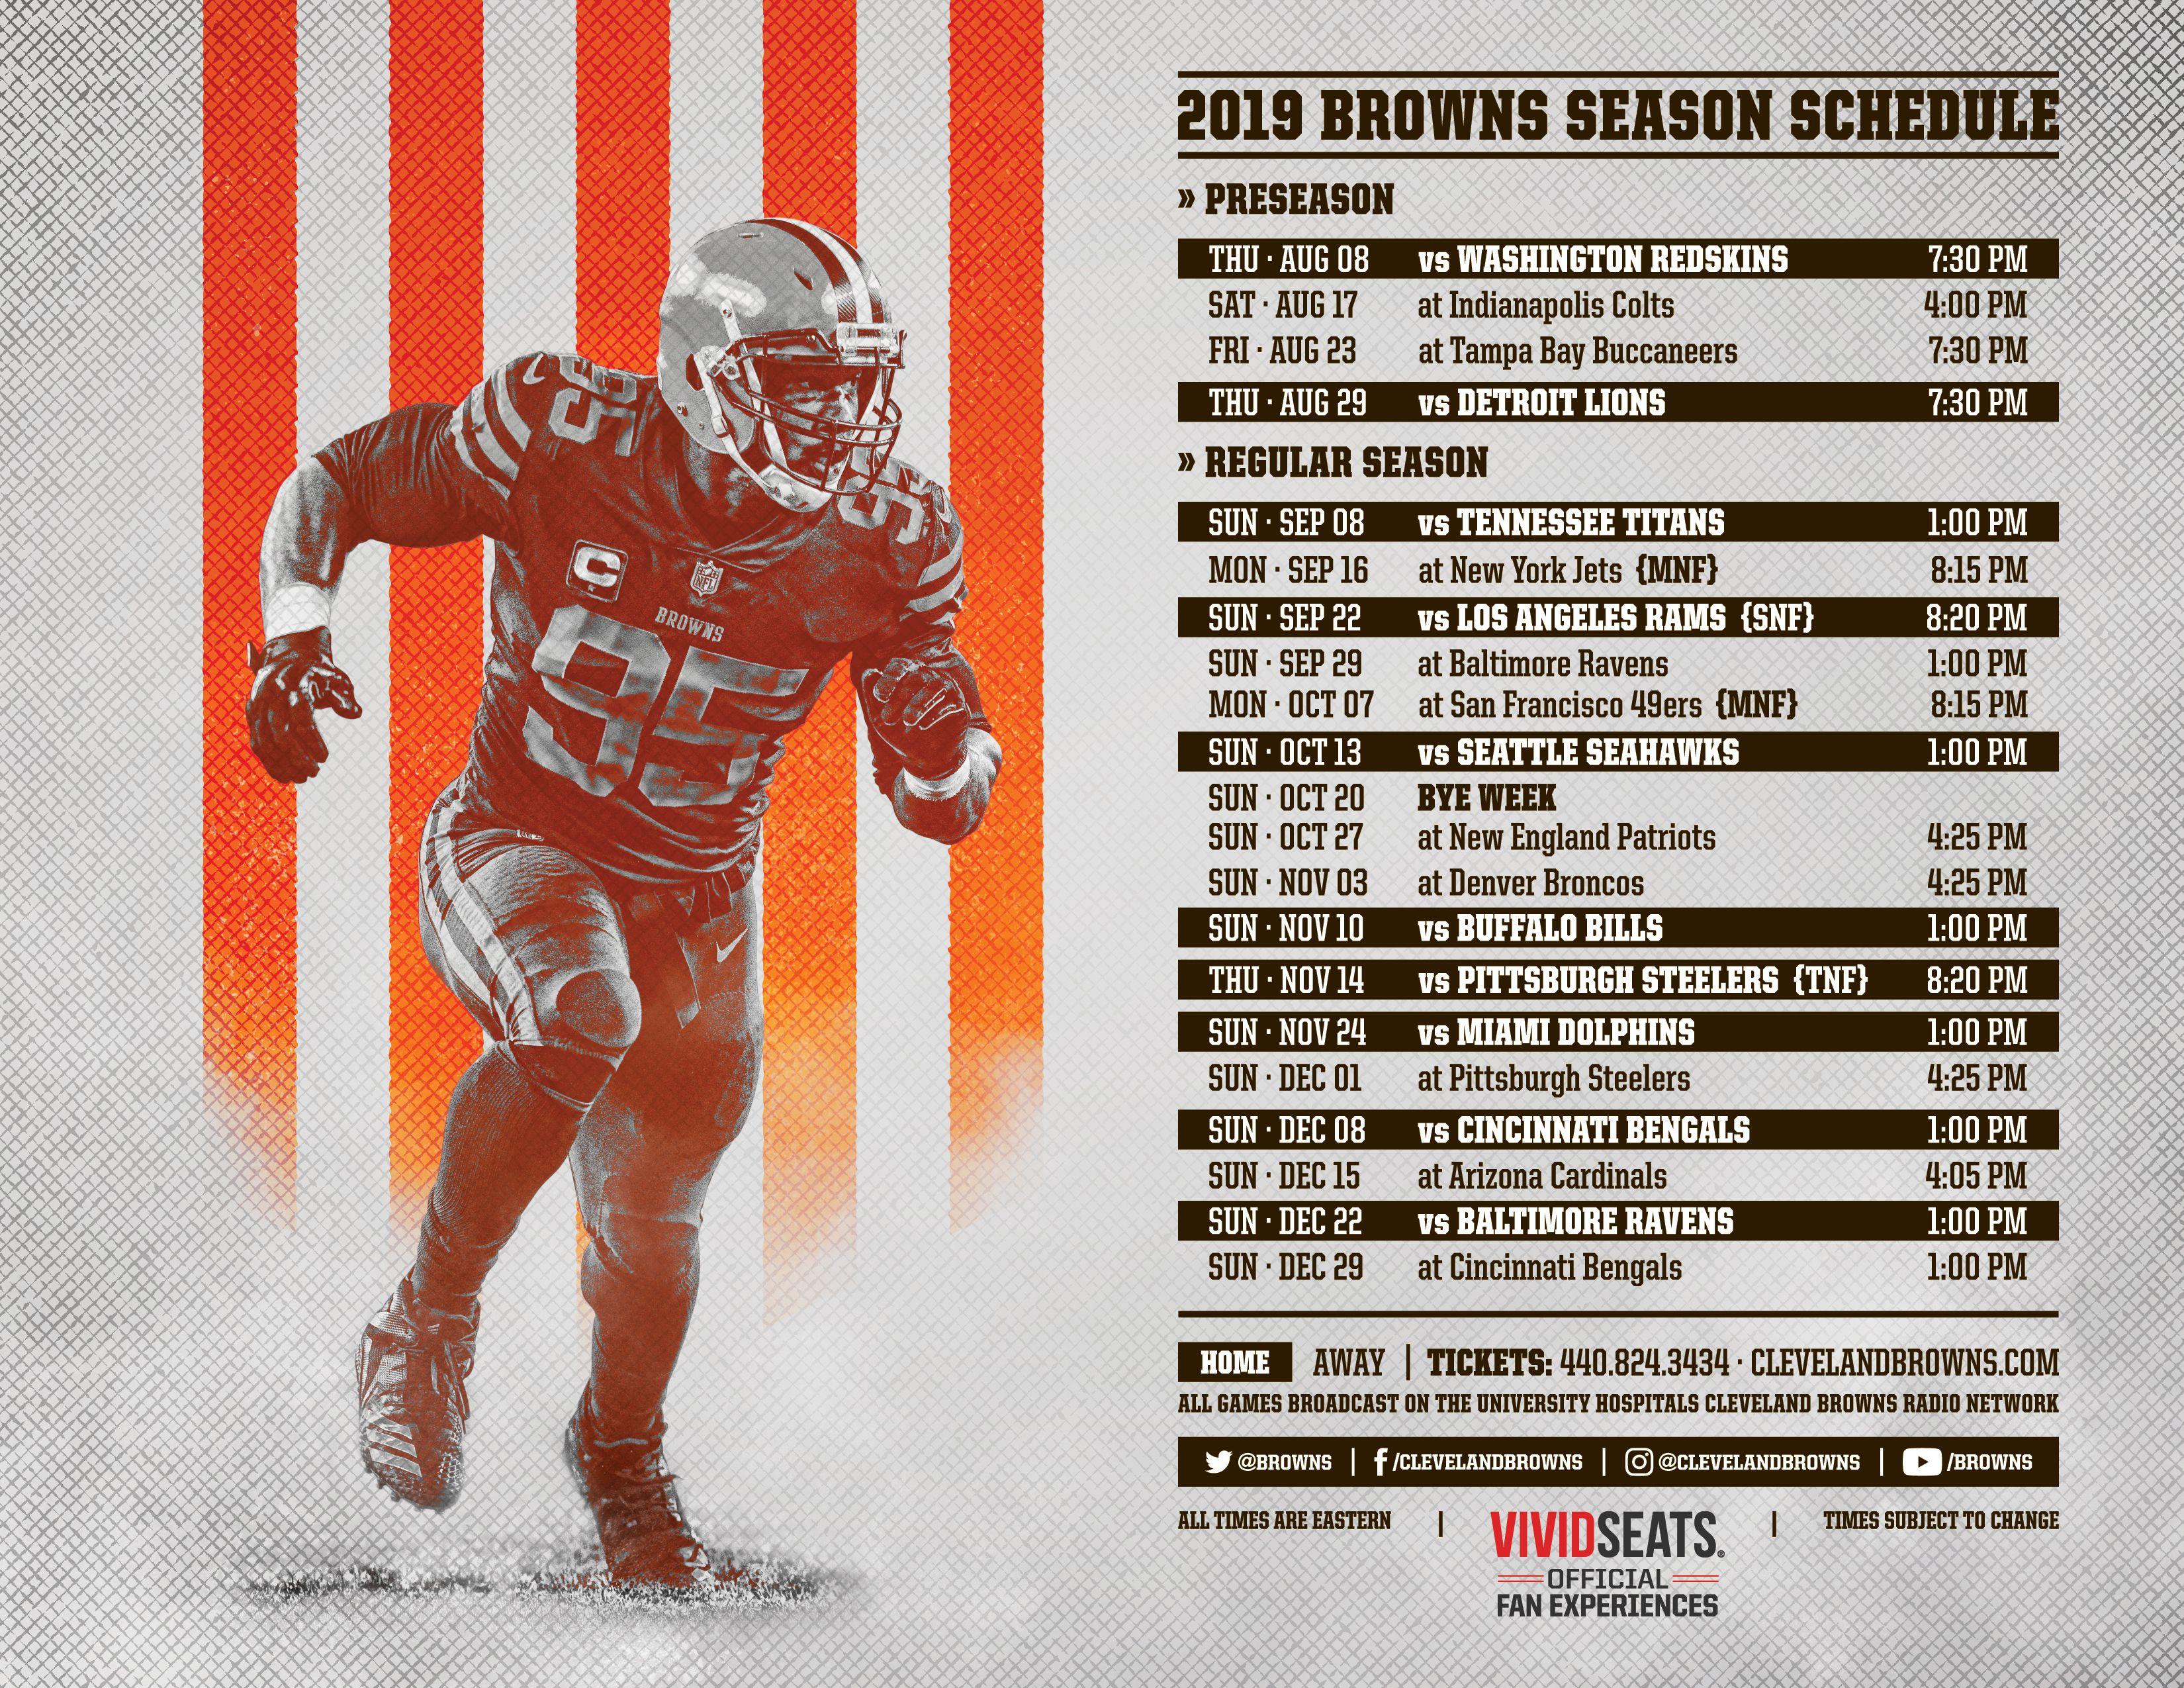 2019 Cleveland Browns Schedule Detroit Lions Tennessee Titans Browns Schedule